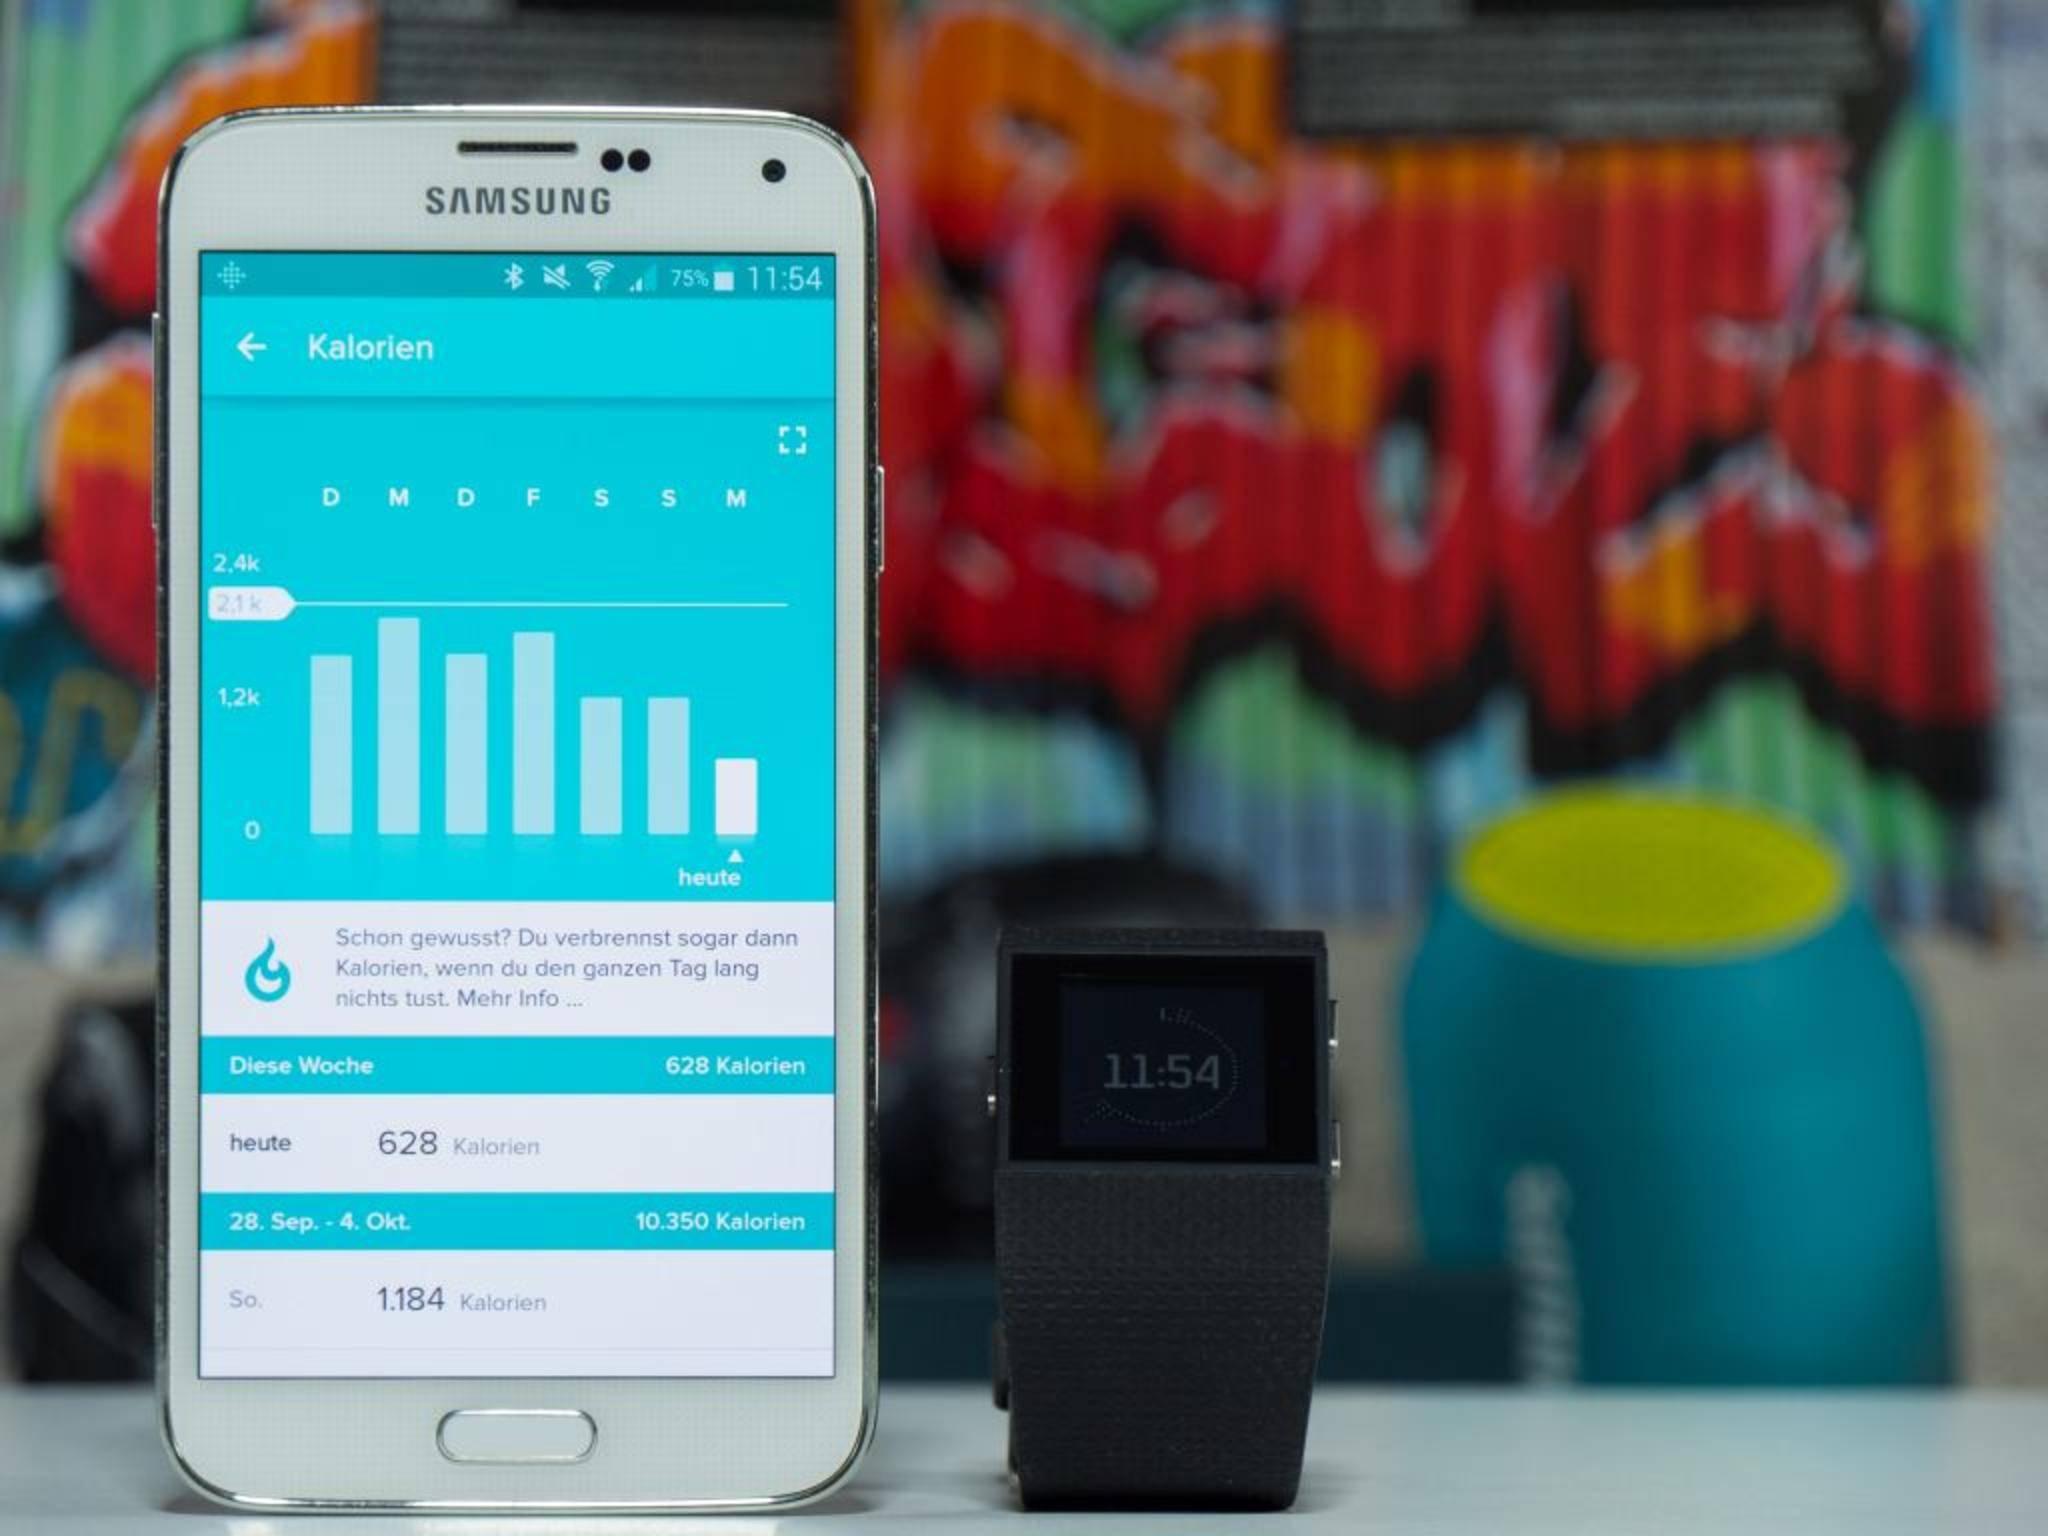 Andere Infos gibt's per Touchscreen-Berührung, physischem Knopfdruck oder in der App.